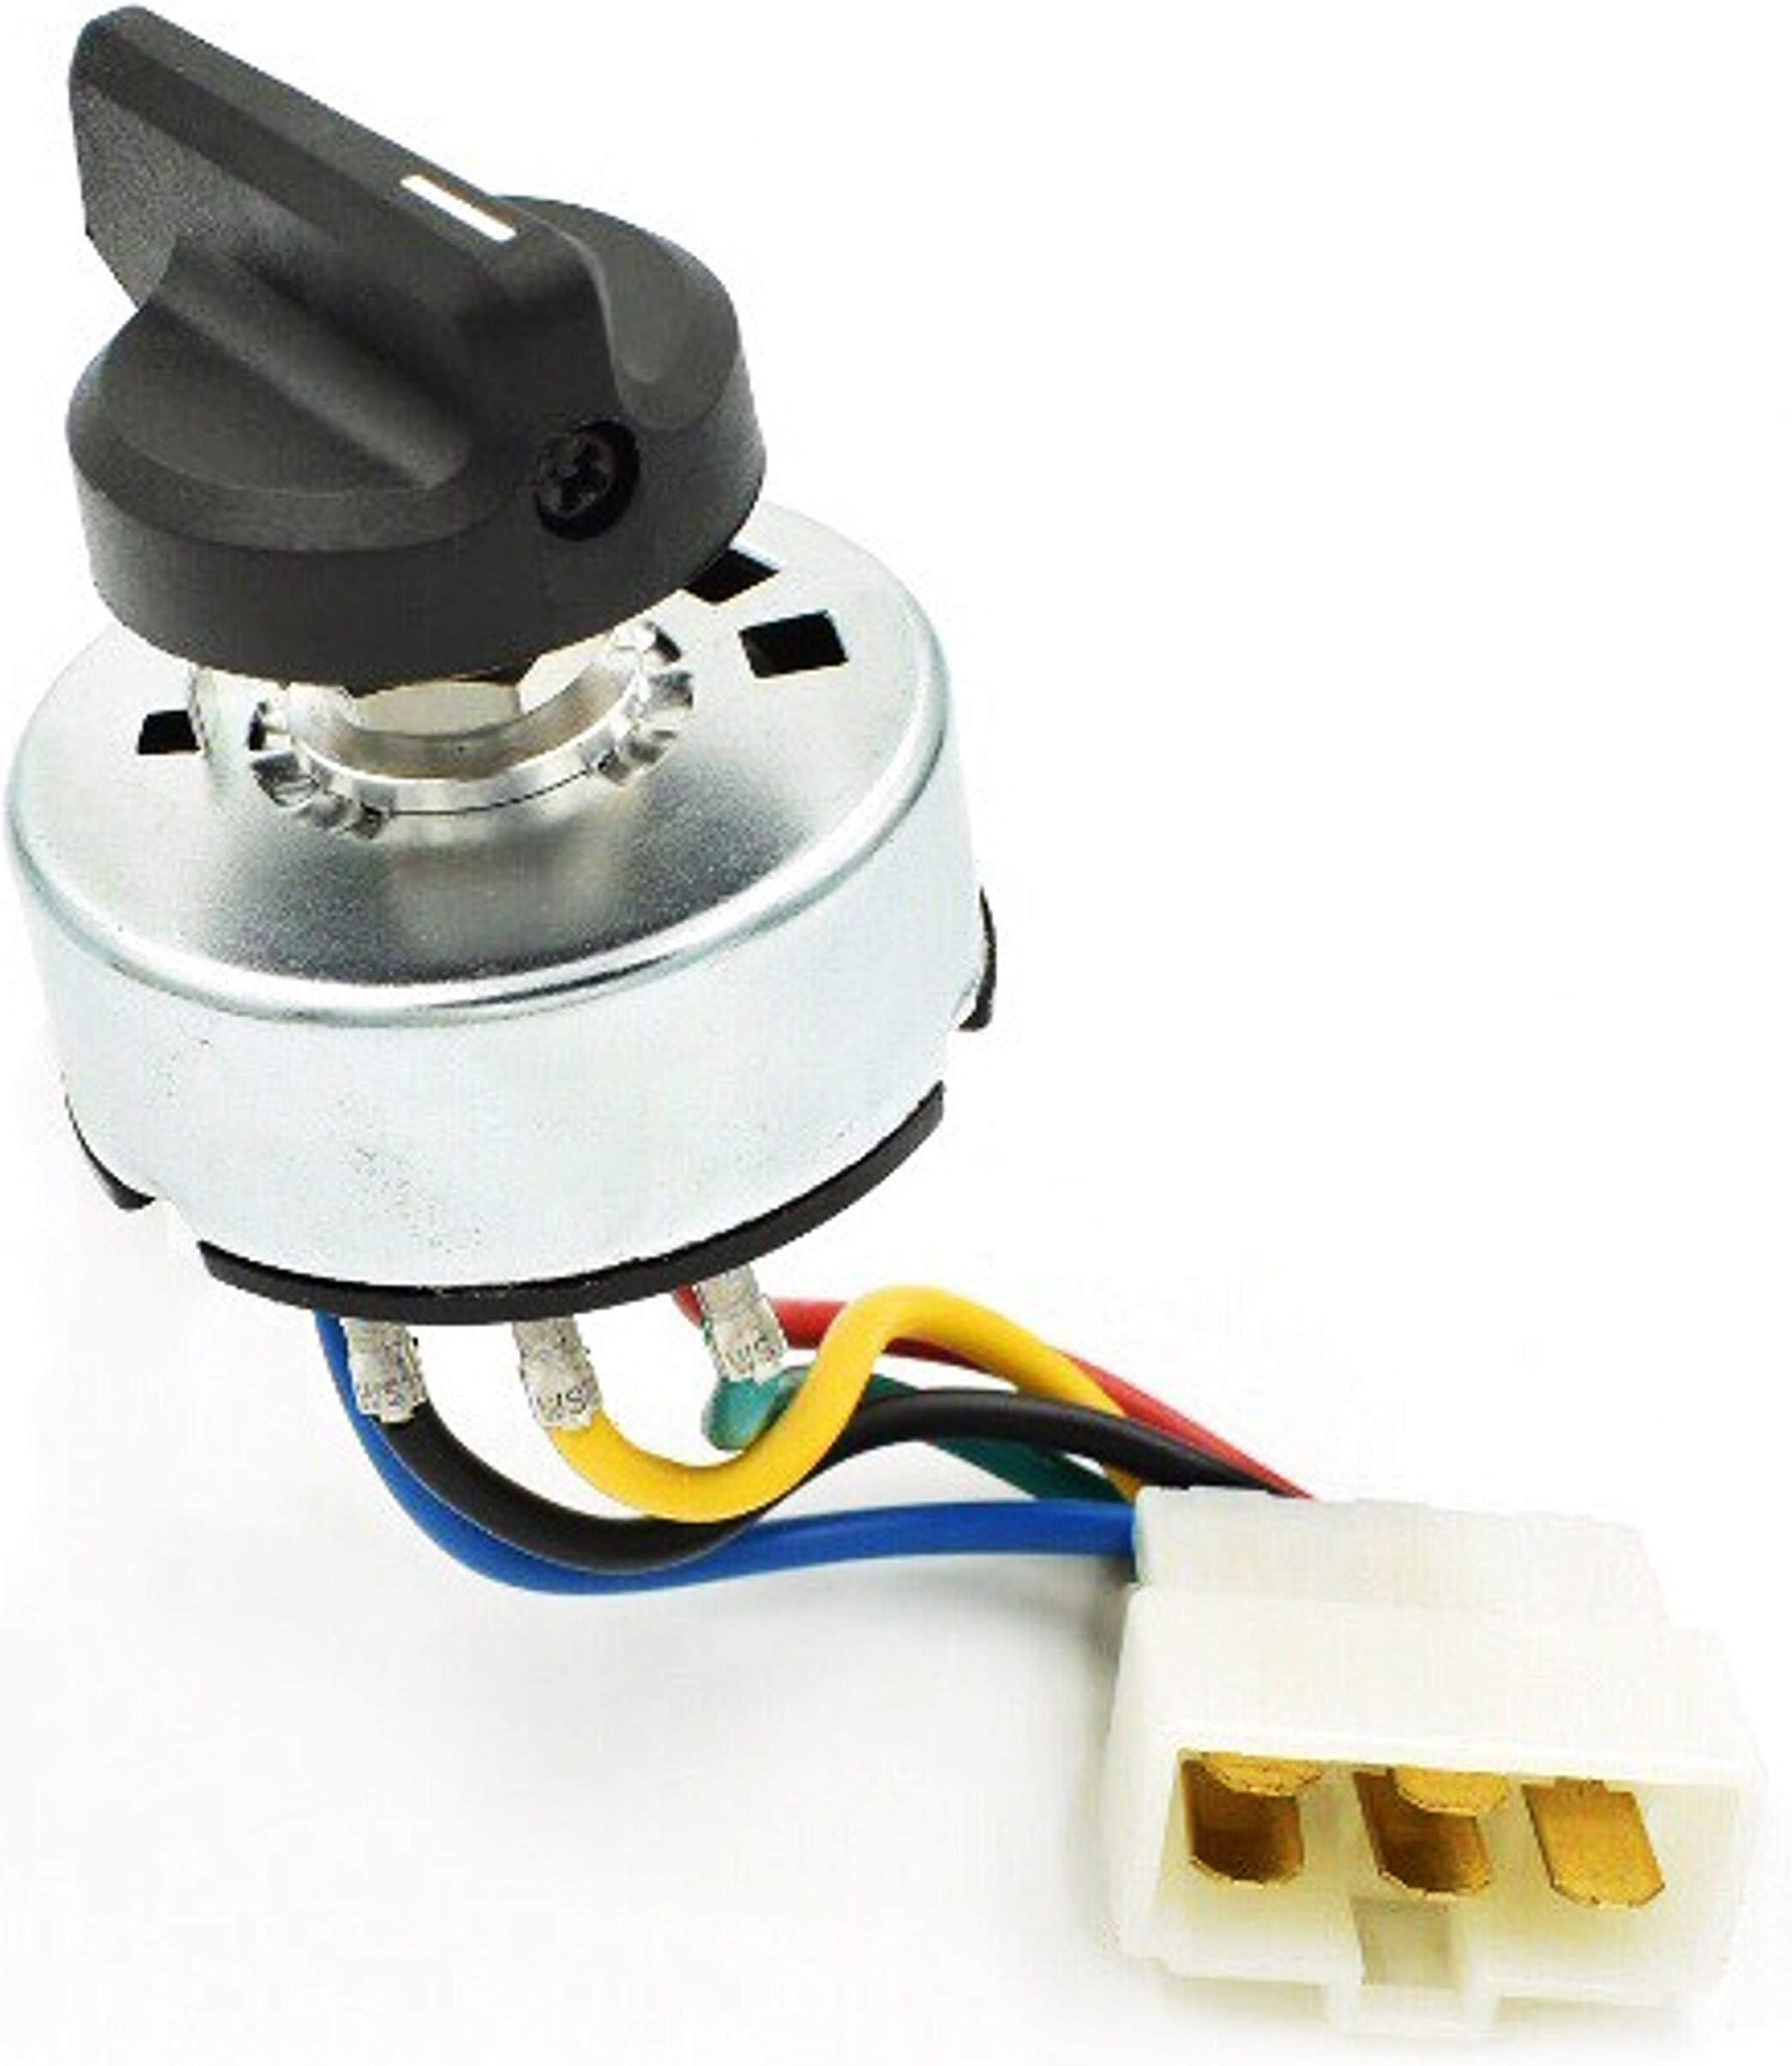 John Deere 855 Light Switch AM876786 for sale online